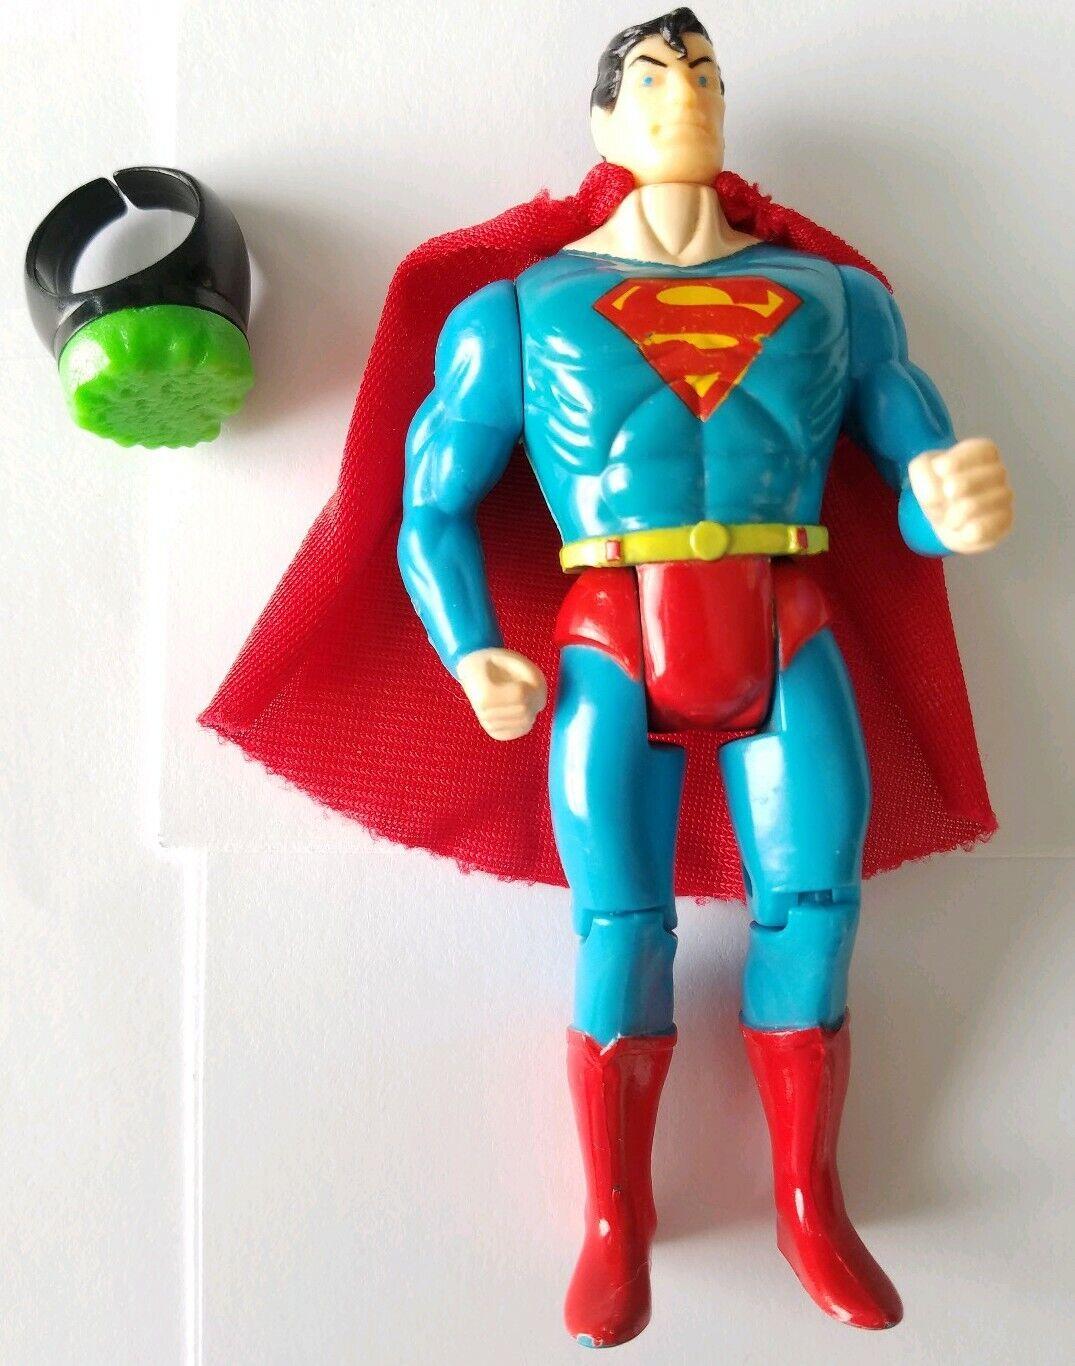 DC Comics Super  Heroes Superuomo w Kryptonite Ring (giocattoloBiz, 1989)  benvenuto a comprare